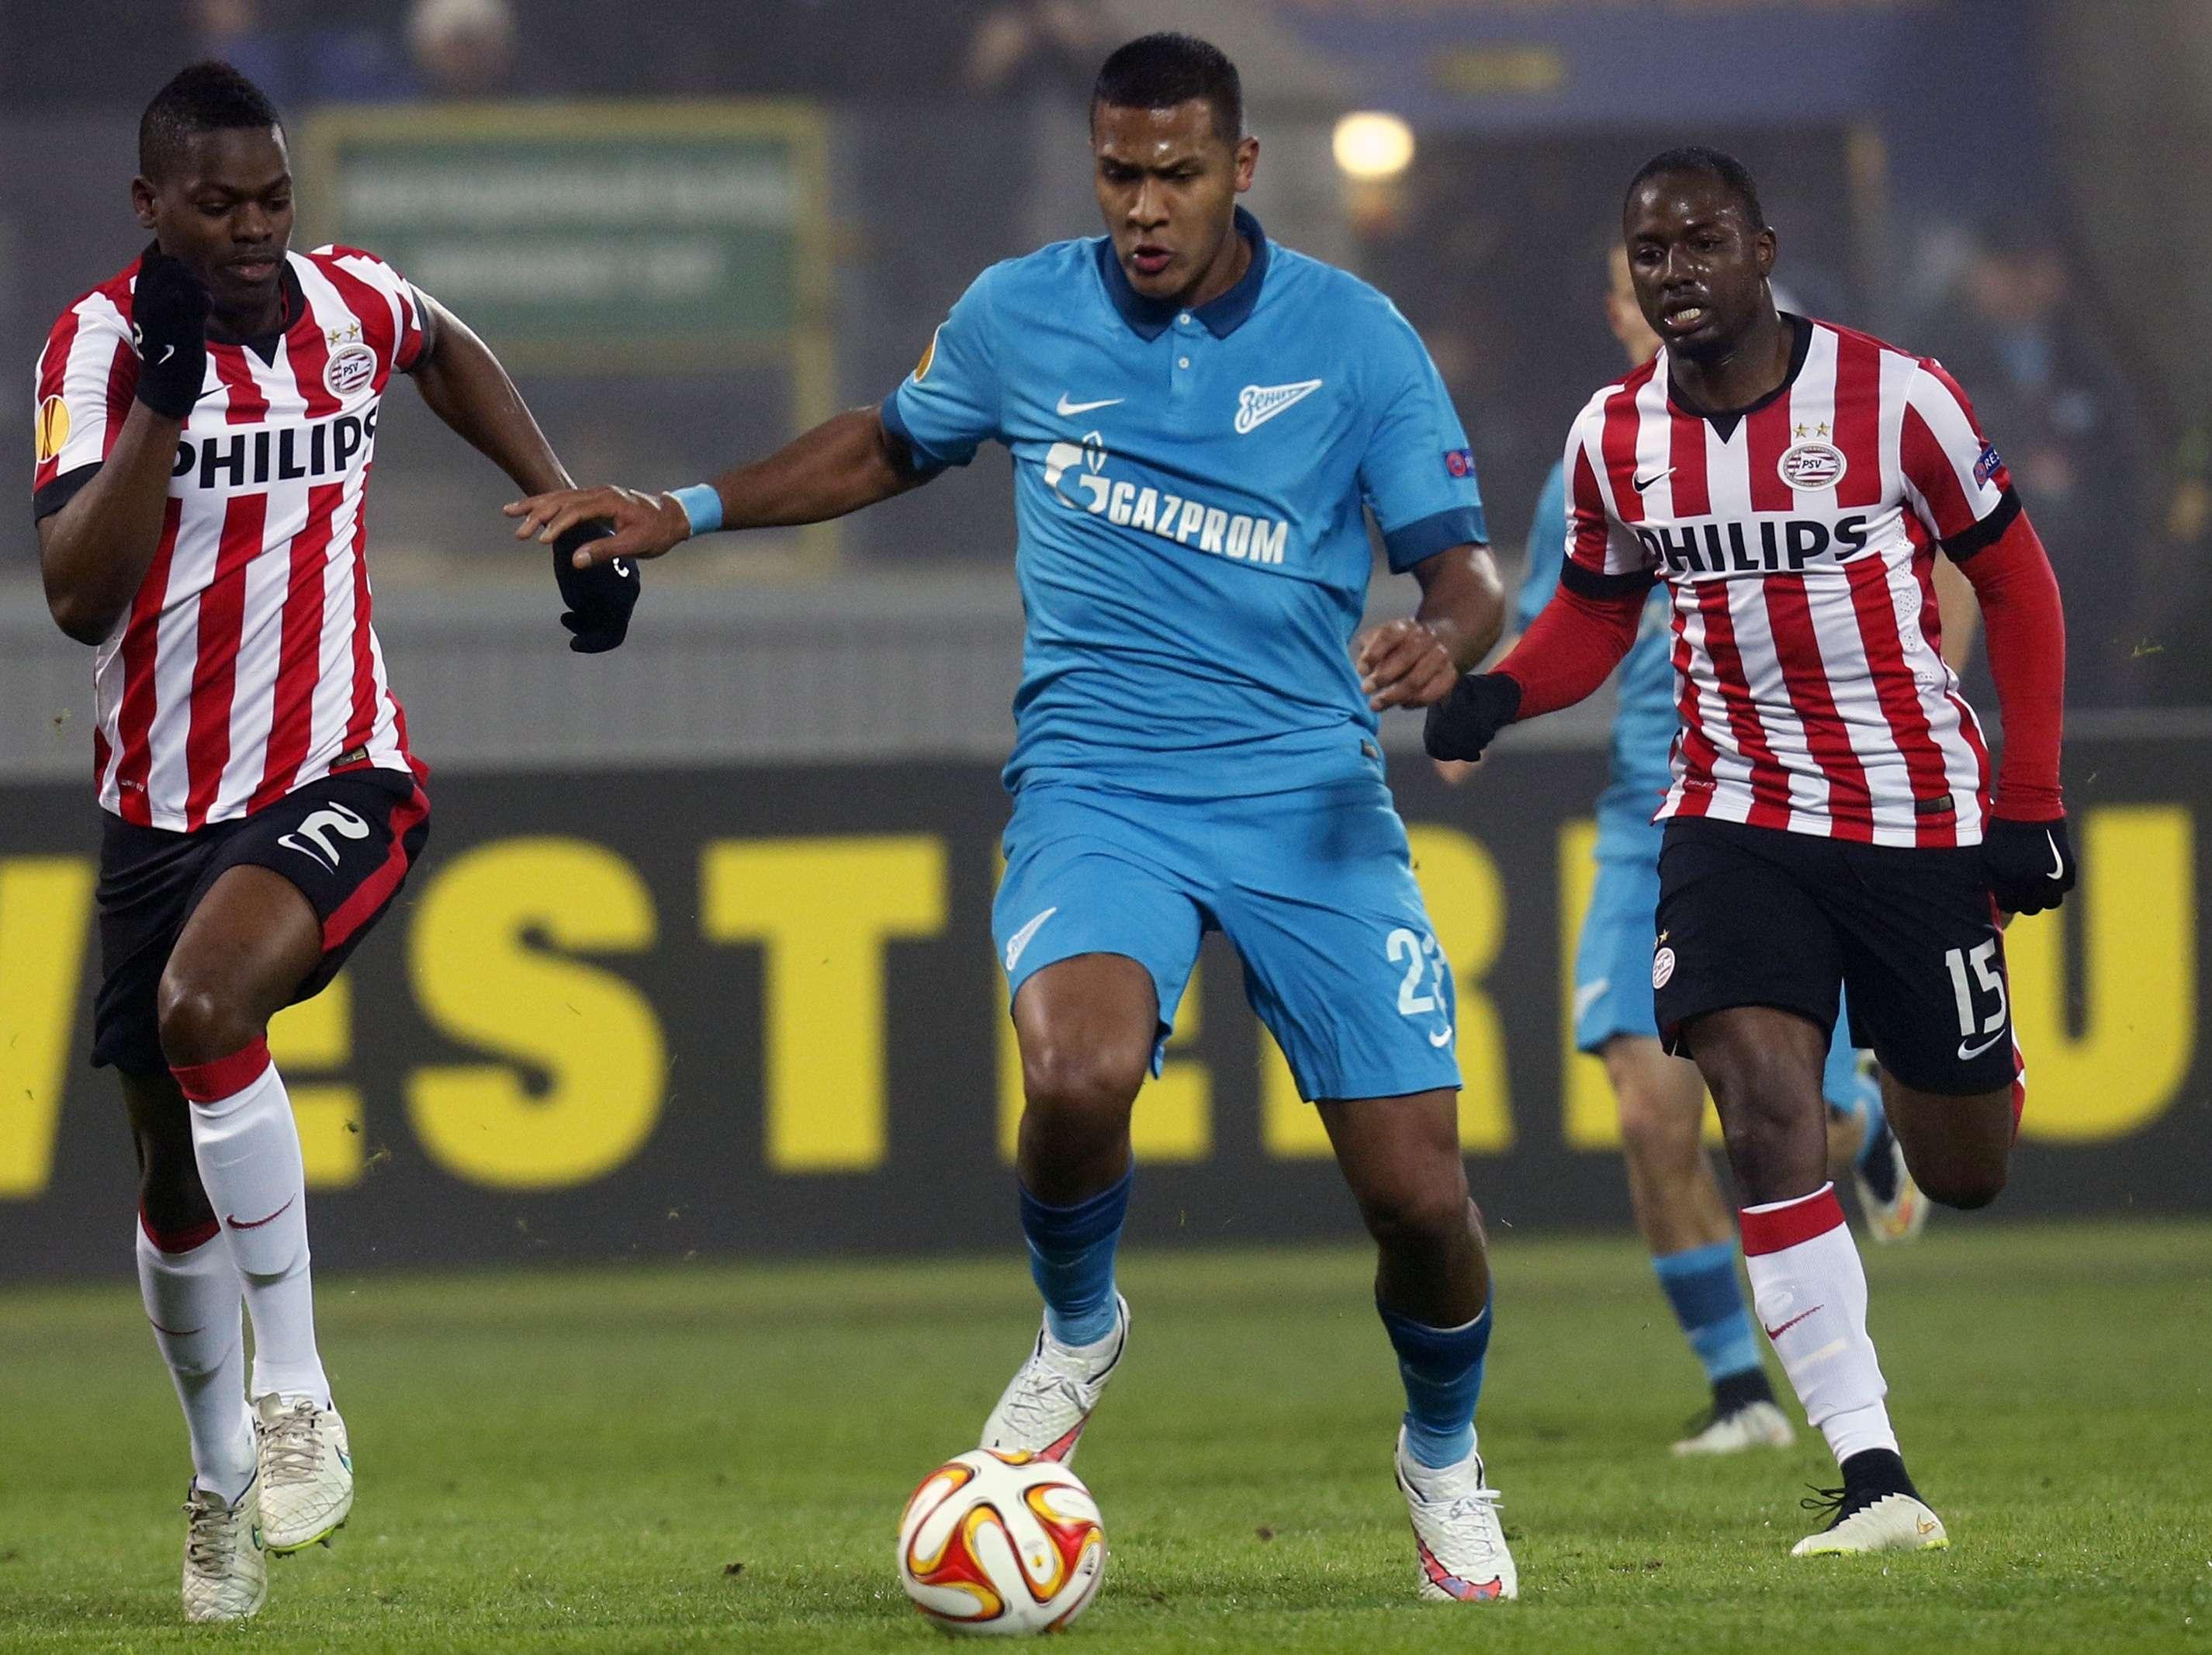 José Salomón Rondón marcó un doblete en la goleada de Zenit 3-0 sobre PSV Eindhoven. Foto: AP